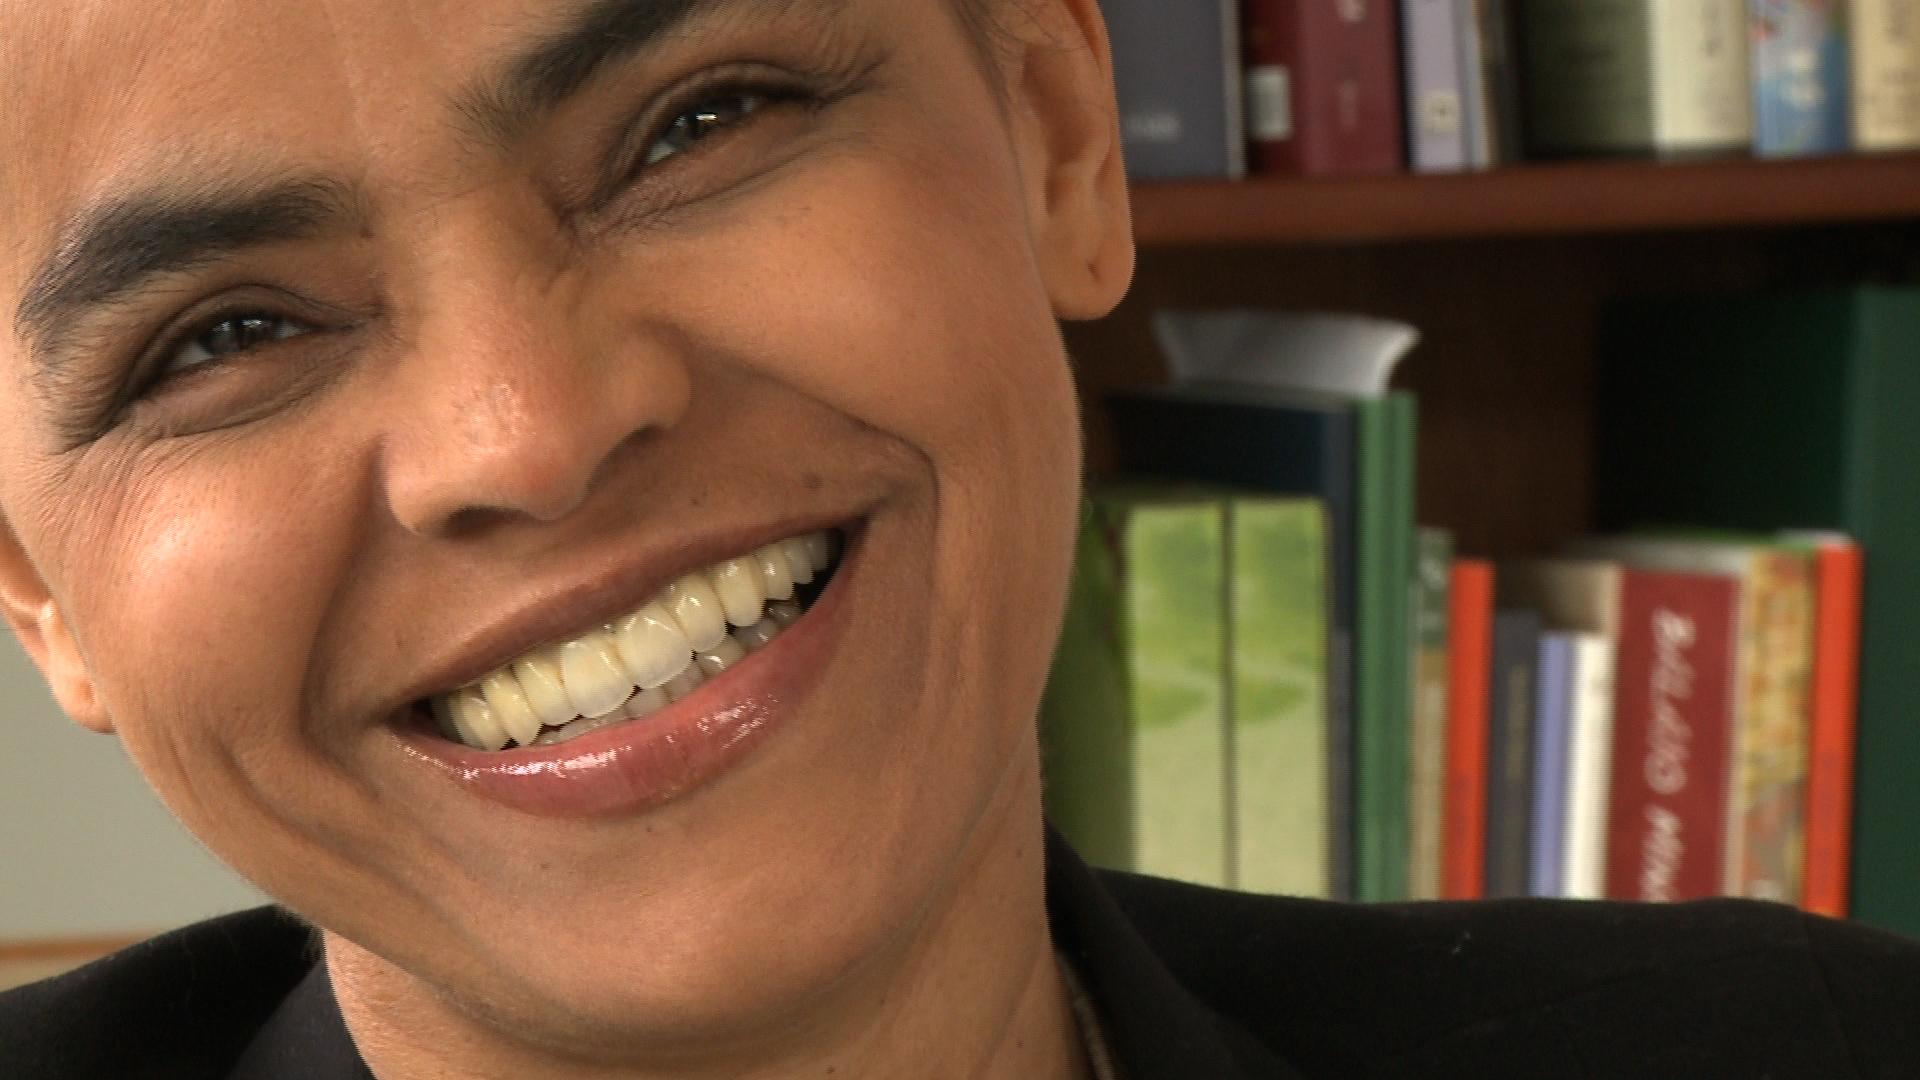 Marina Silva GlobalLeadership.TV